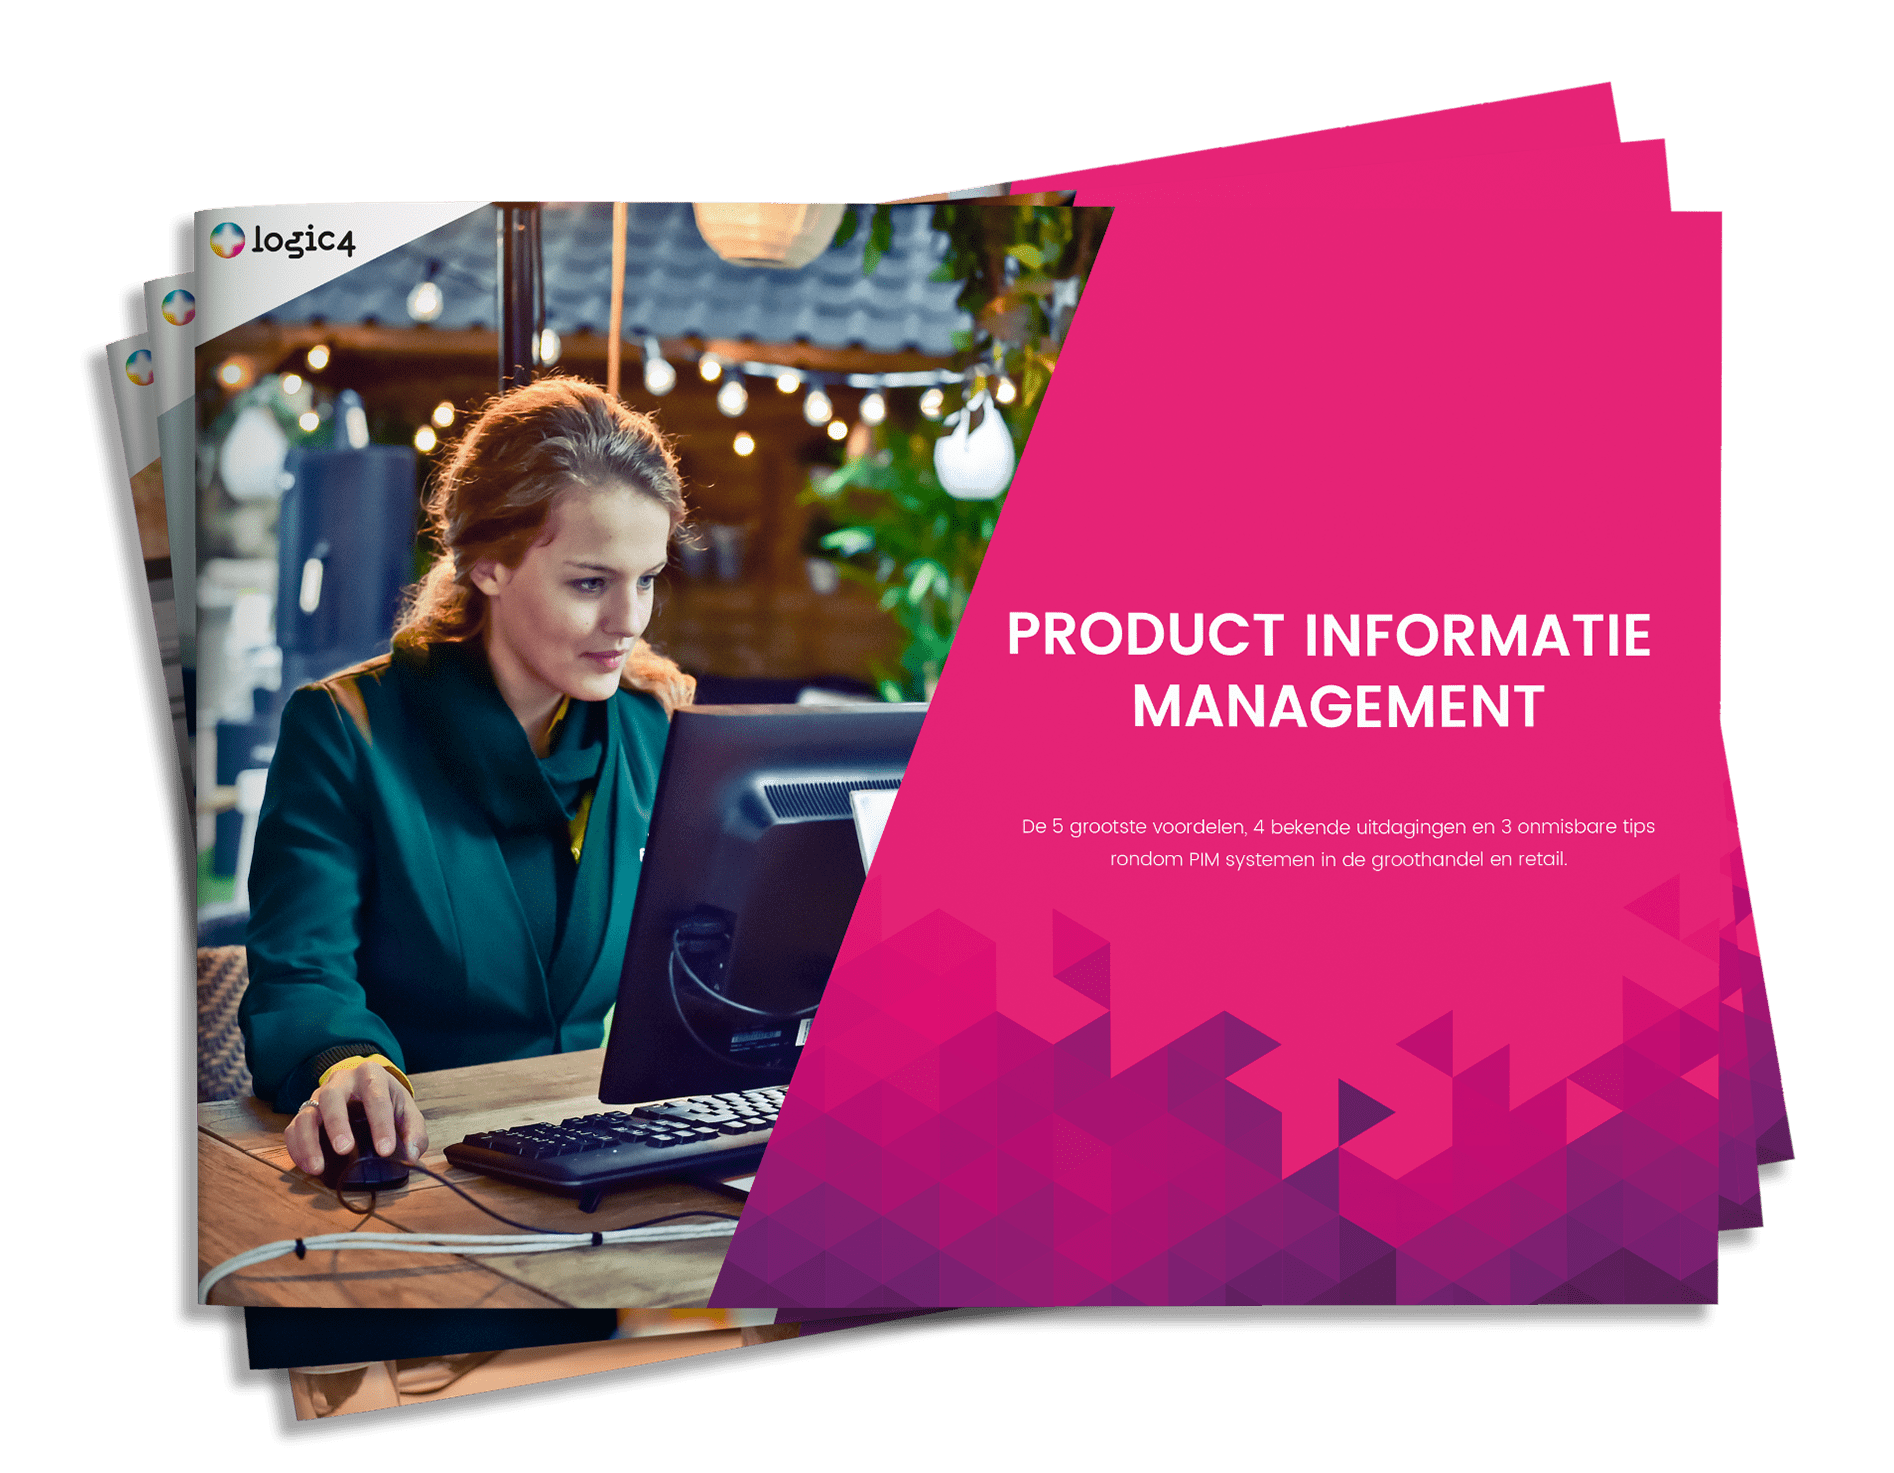 Whitepaper Product Informatie Management